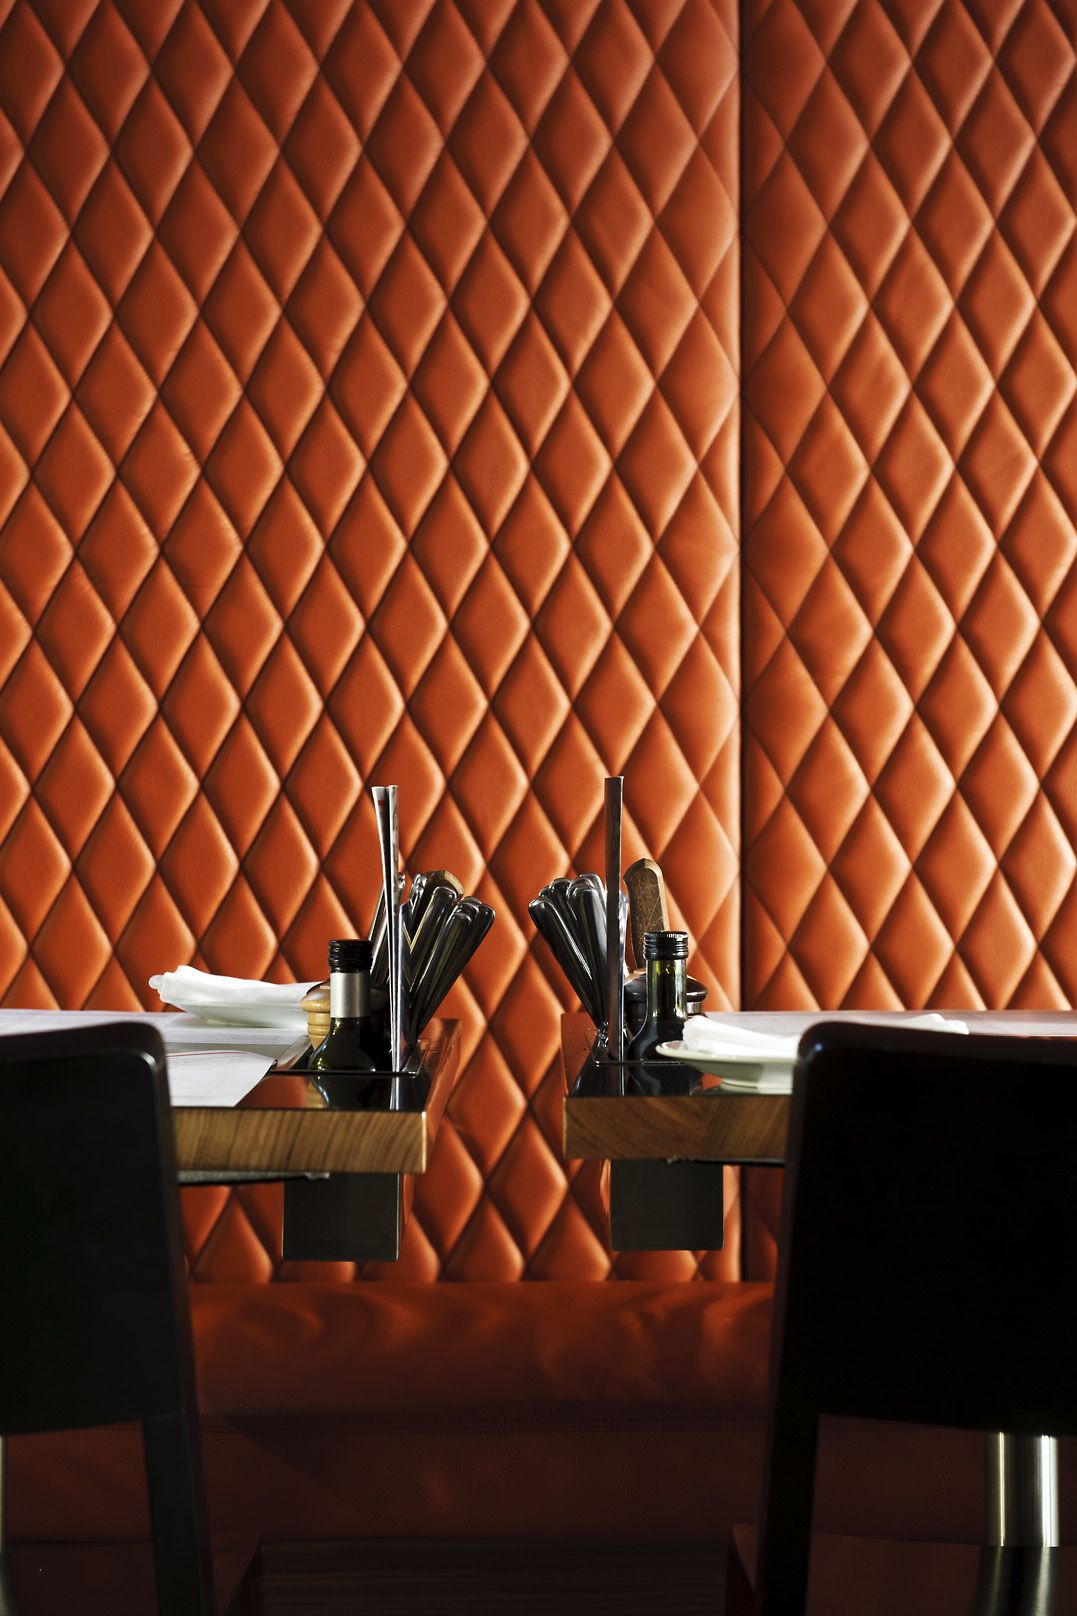 LaLola Design Interiordesign Interiorarchitecture Architecture Hospitality Restaurant Perthdining